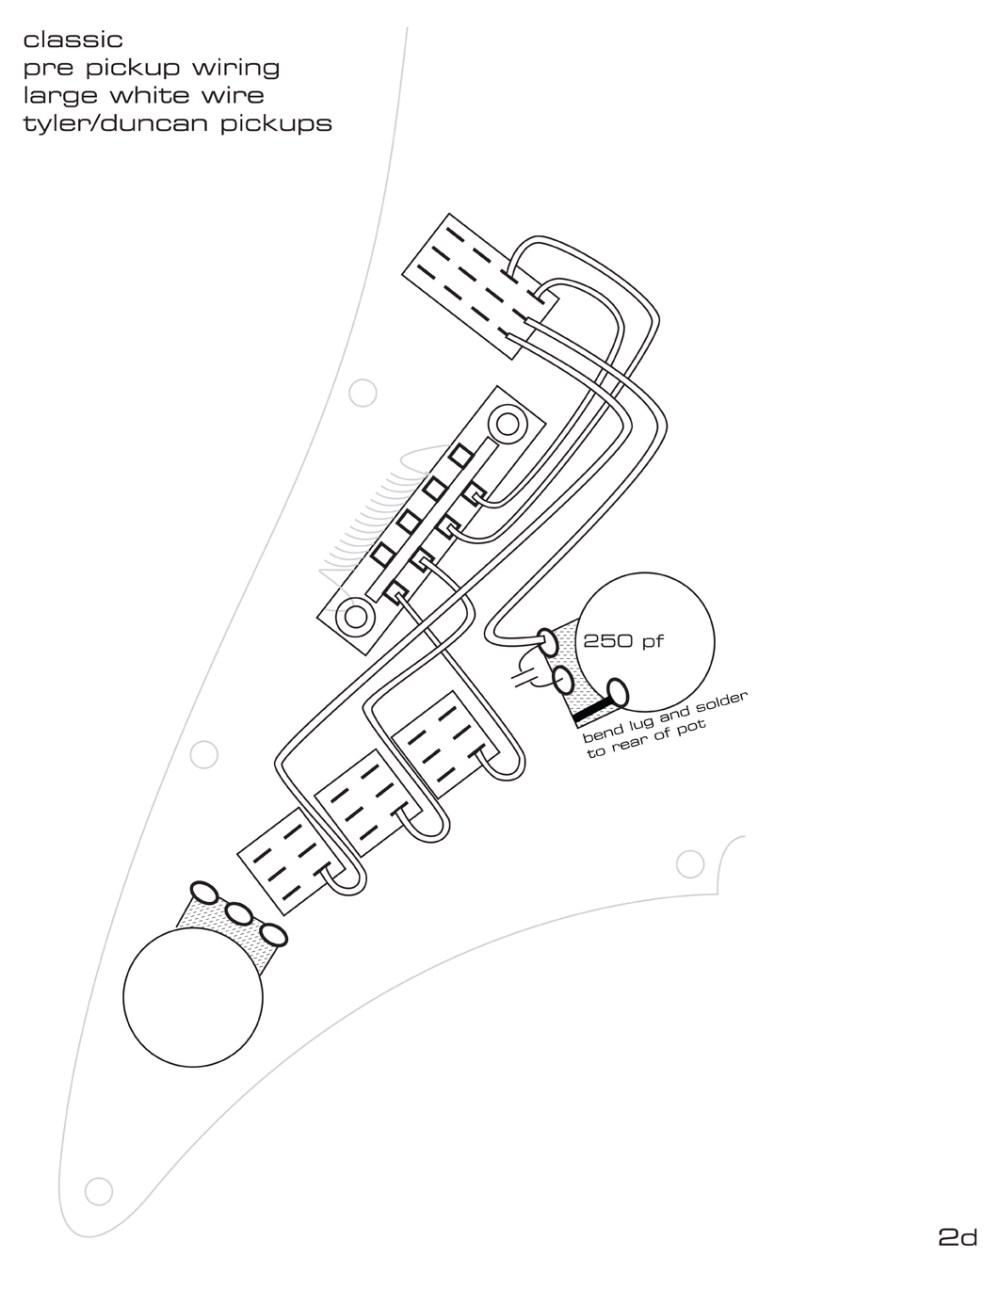 medium resolution of classic tyler duncan wiring diagram page 2 jpg